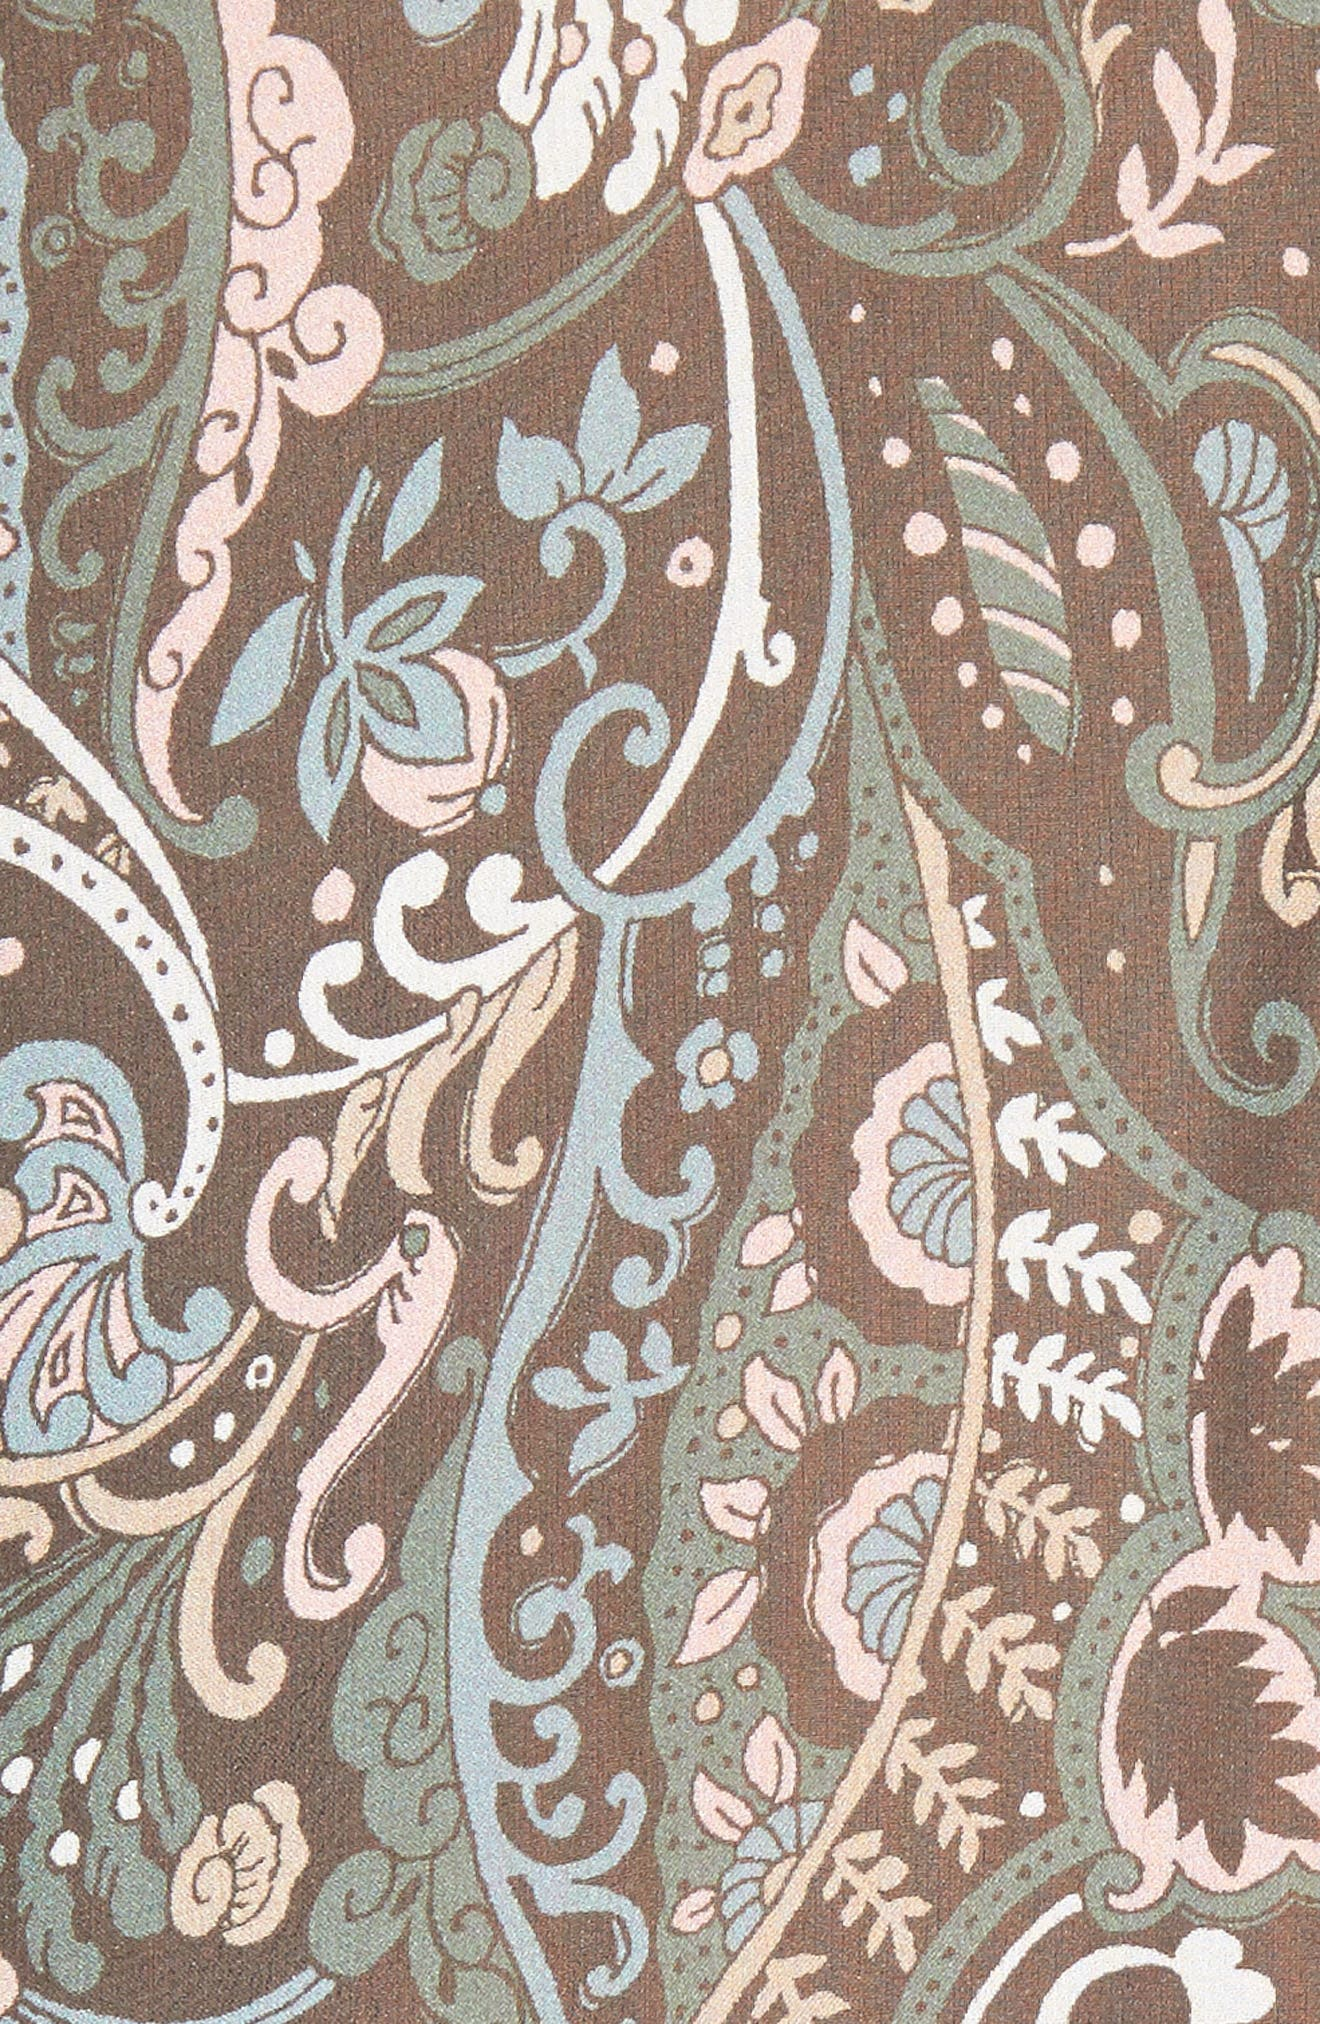 Gayle Paisley Print Silk Blouse,                             Alternate thumbnail 5, color,                             Nude/ Blue/ Green Multi